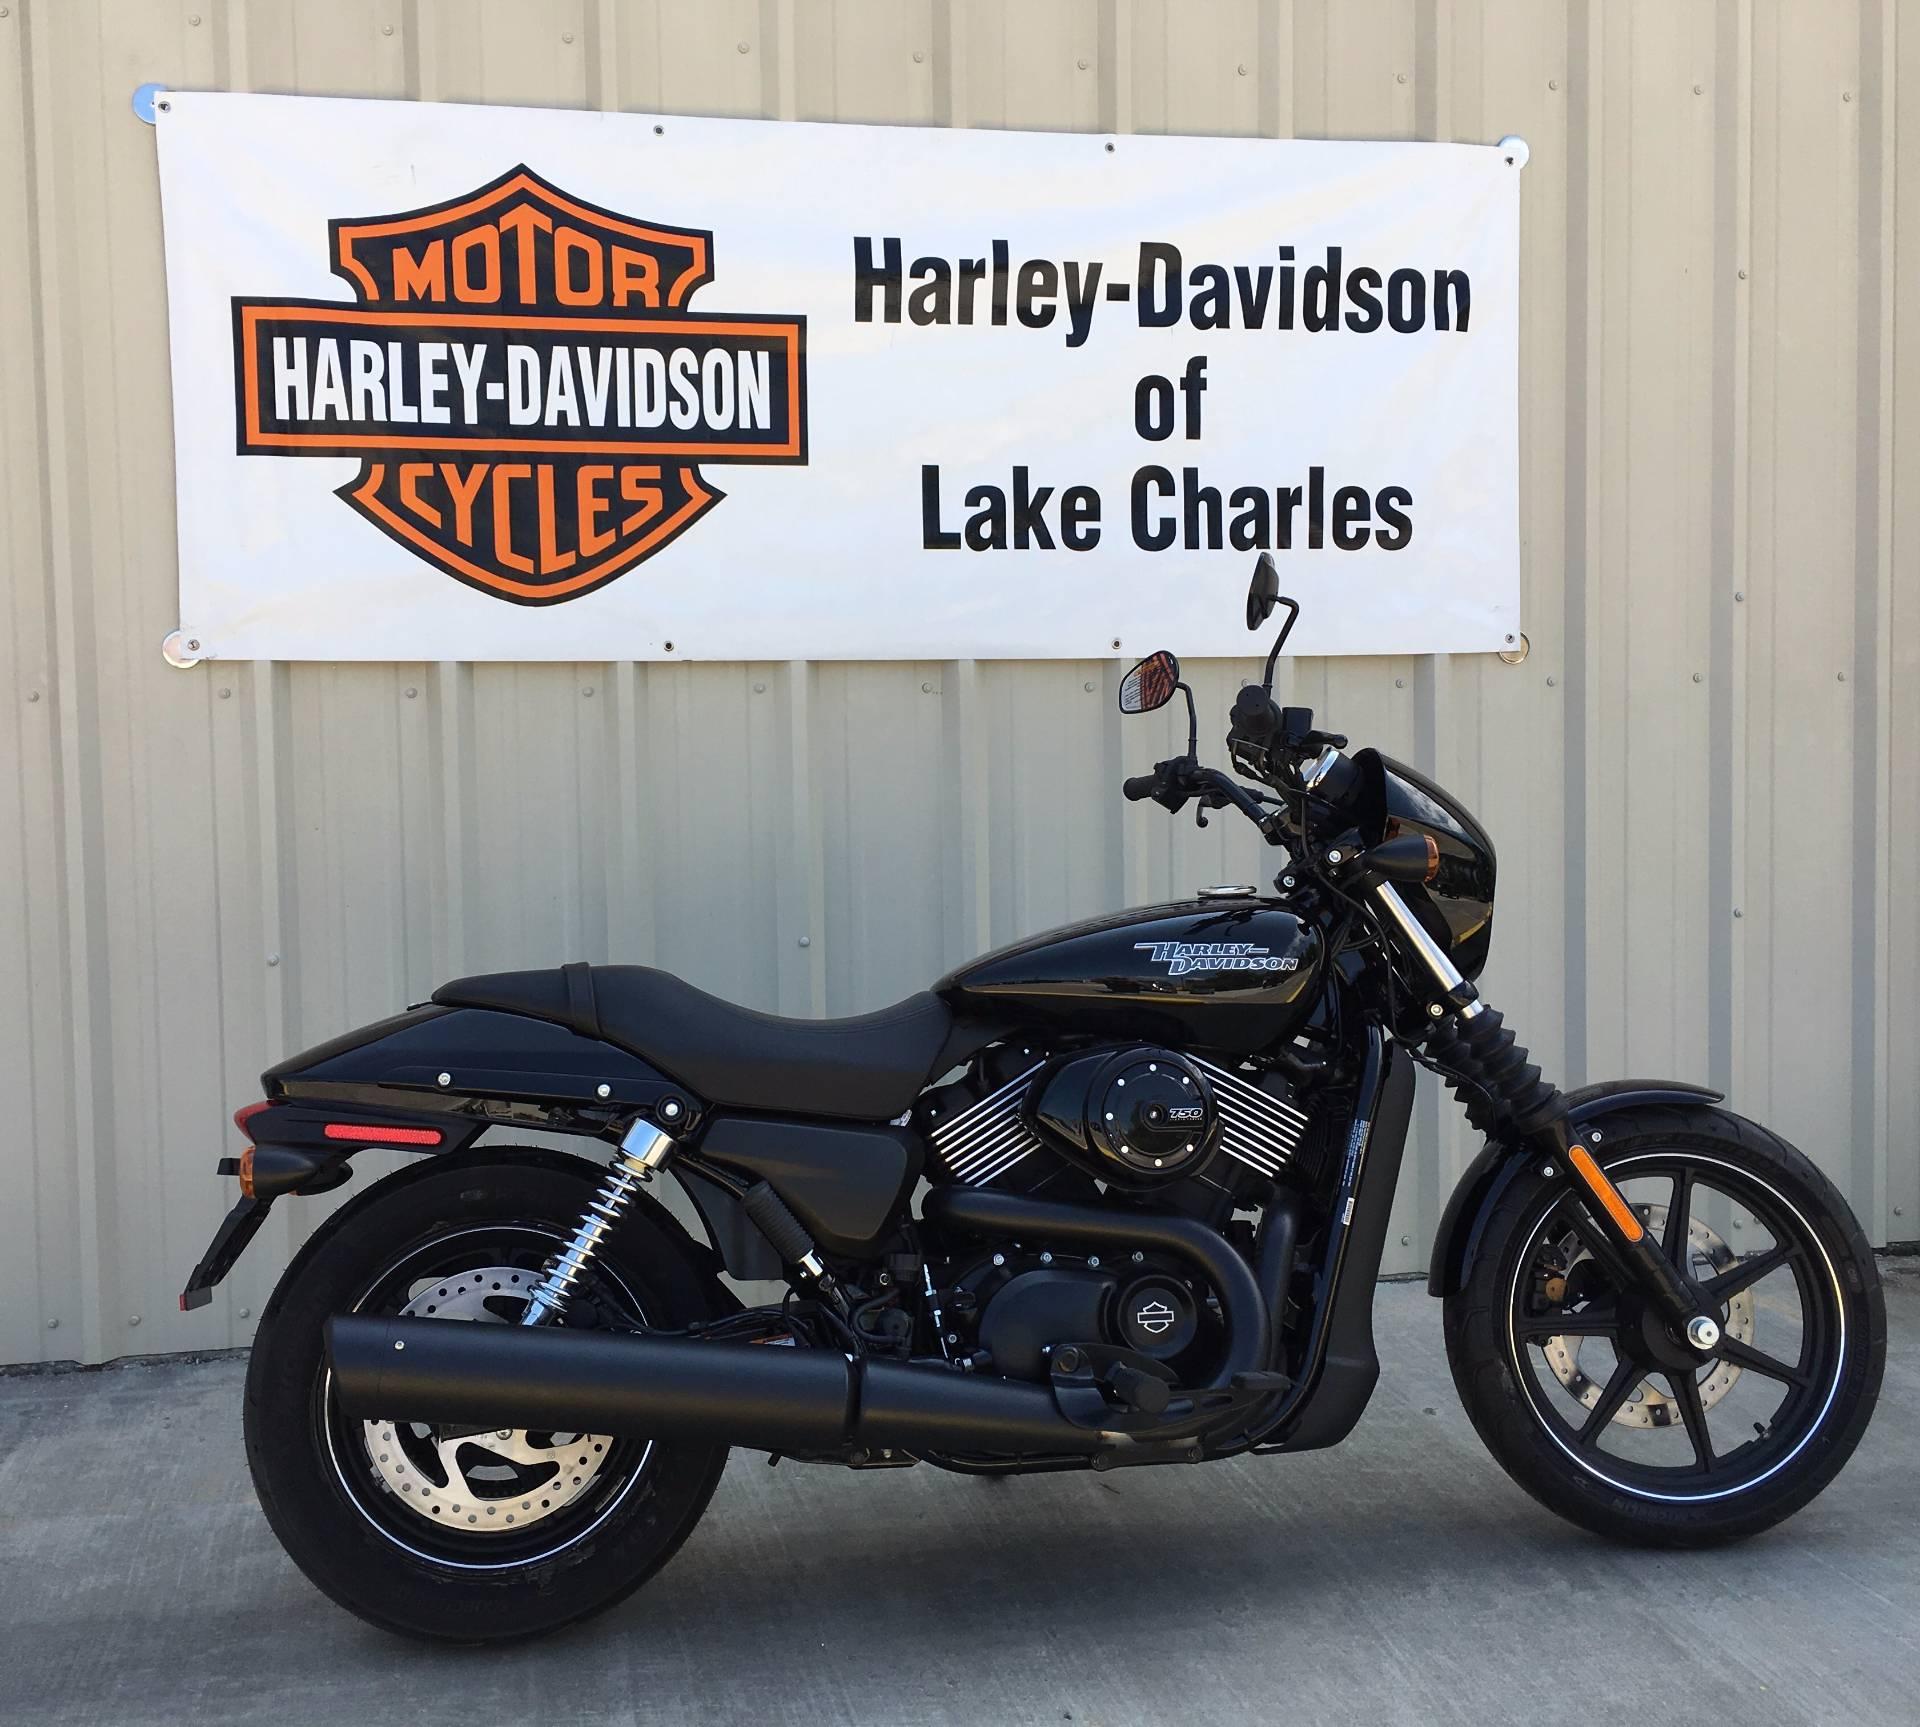 2017 Harley Davidson Street 750 In Lake Charles Louisiana Photo 3